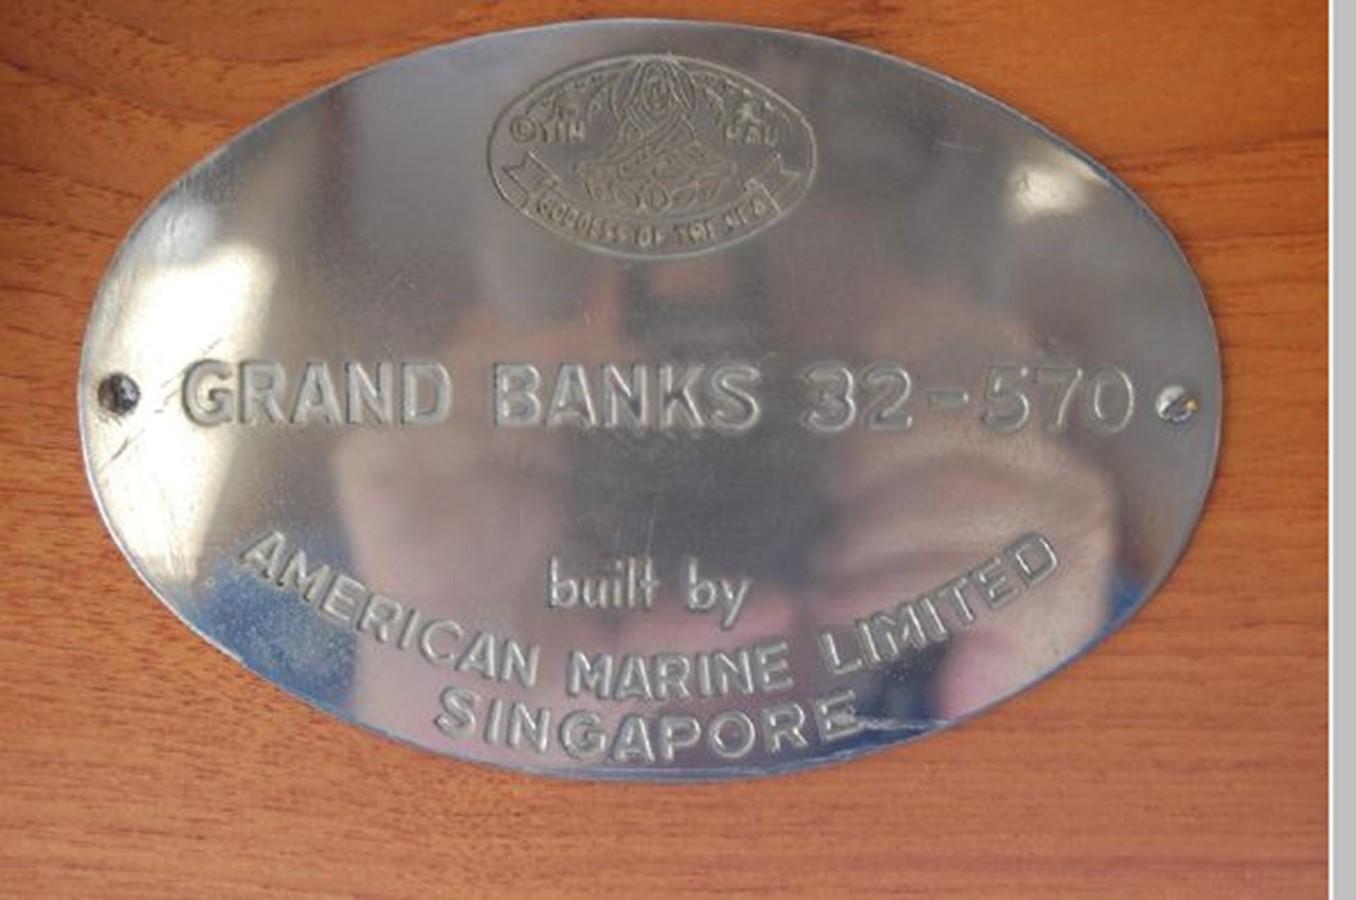 Grand Banks identity plate-32-530 1976 GRAND BANKS  Trawler 2555281